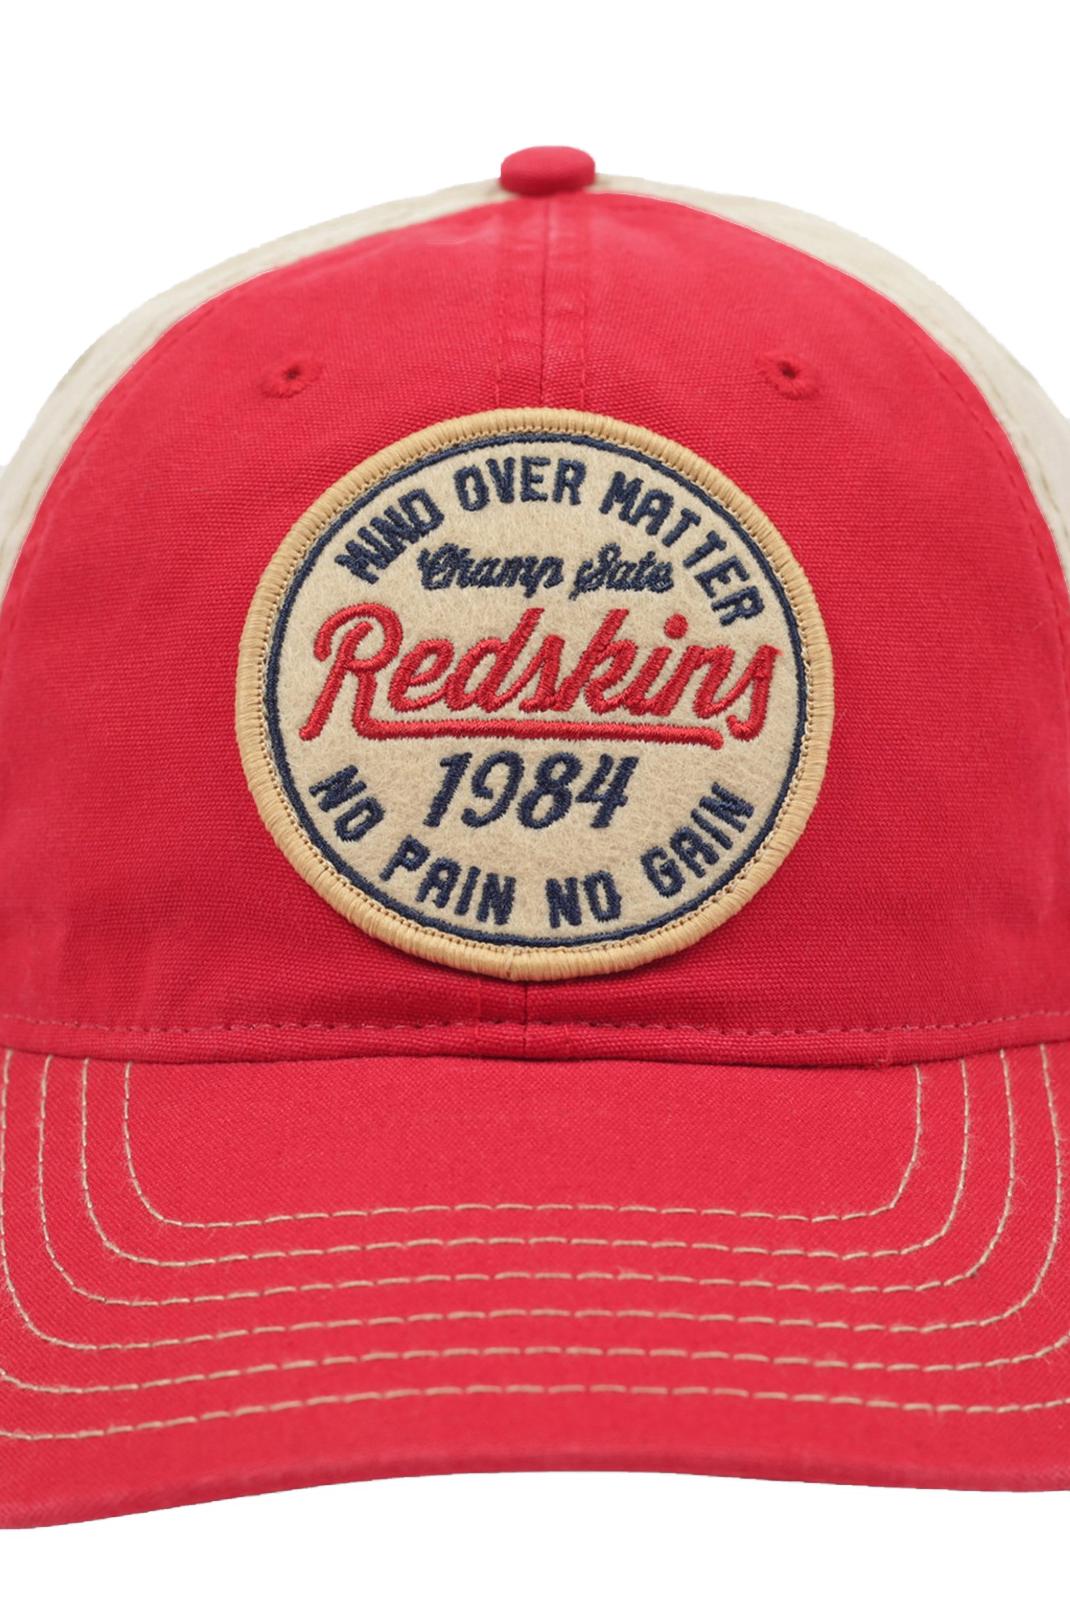 Bonnets / Casquettes  Redskins REDGINGERE ROUGE/BEIGE